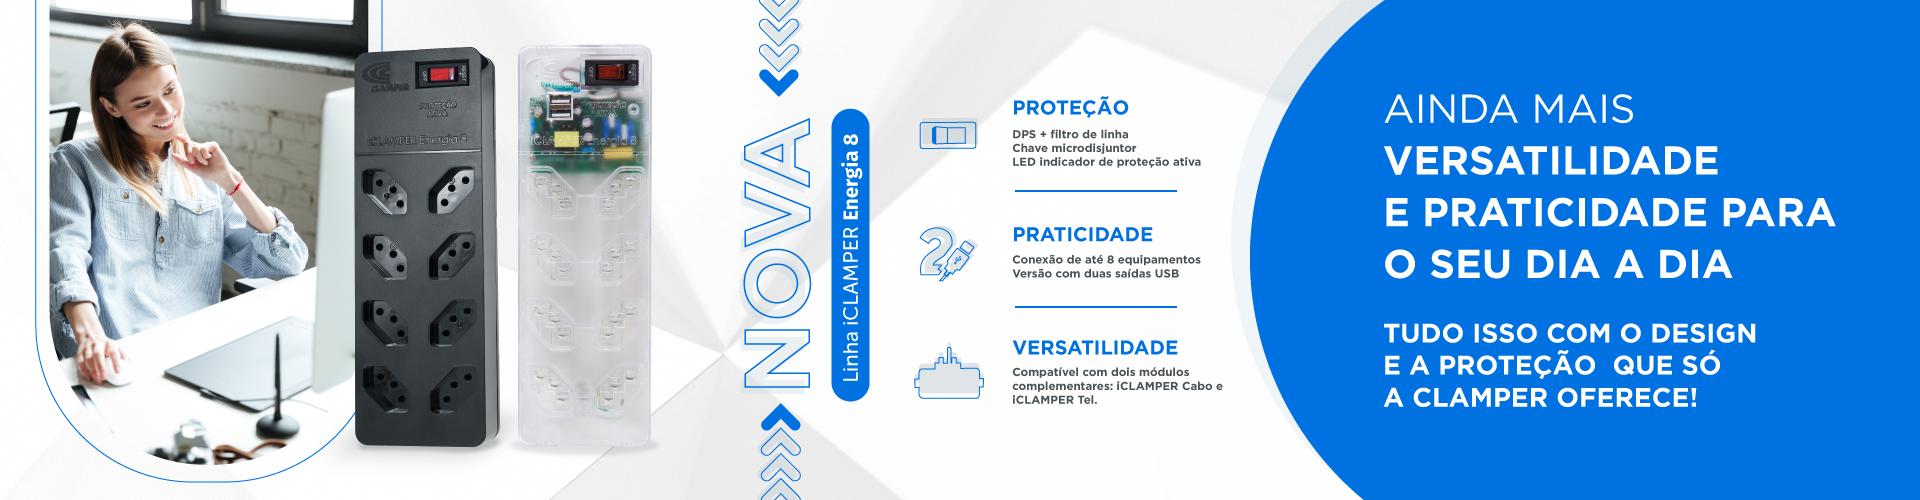 Banner Novo Energia 8